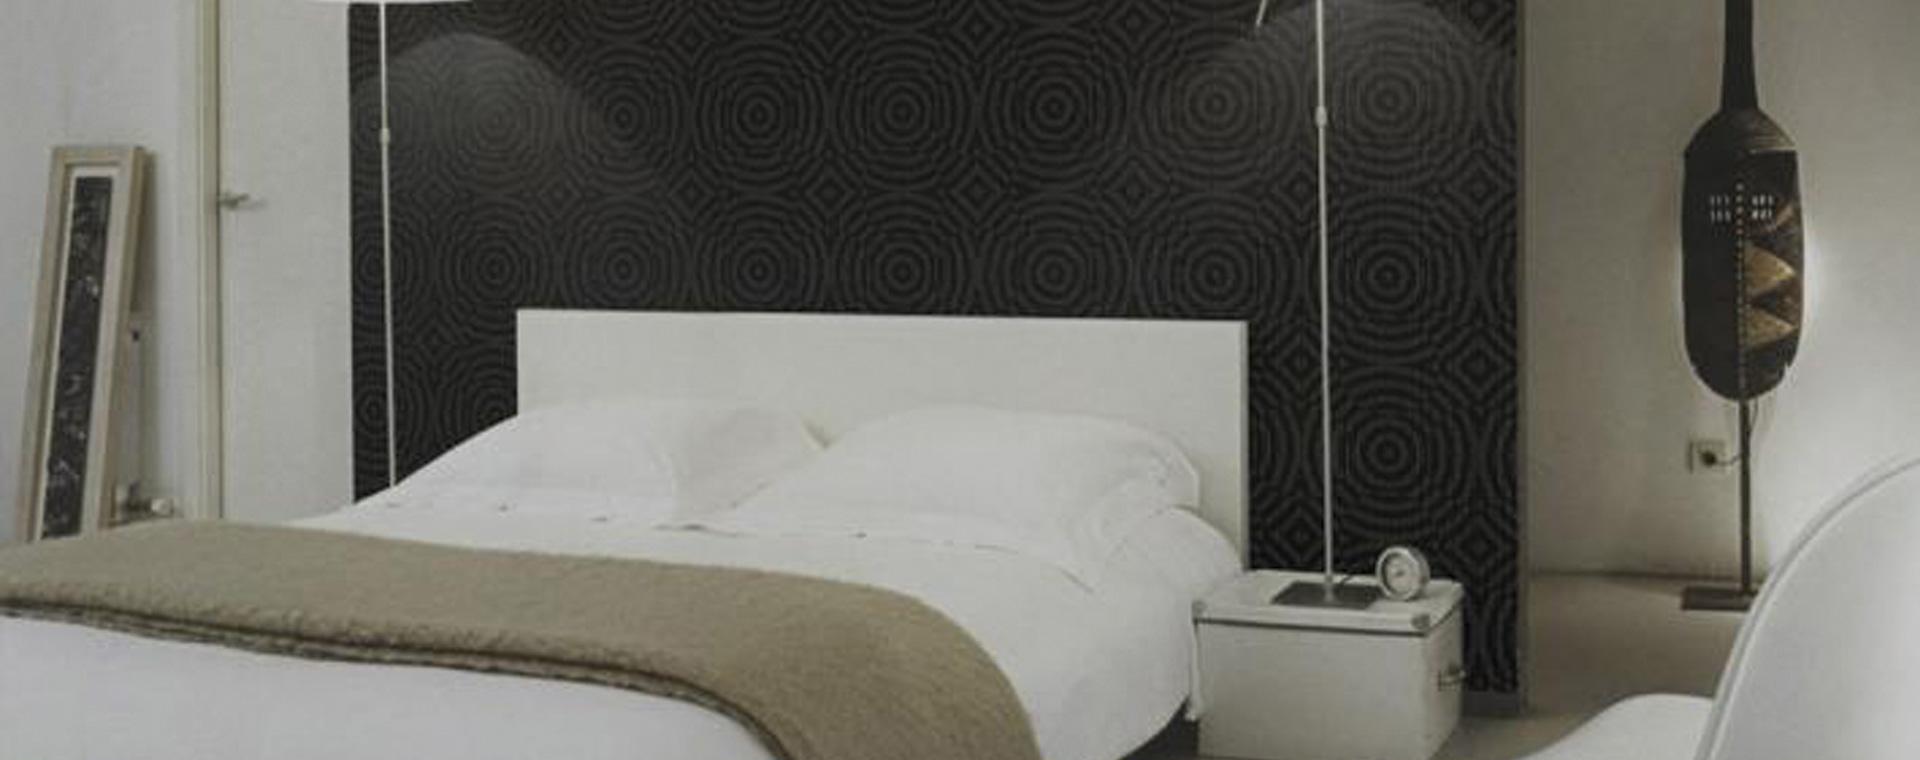 loic prevost peinture yvetot rev tement de sol mur. Black Bedroom Furniture Sets. Home Design Ideas